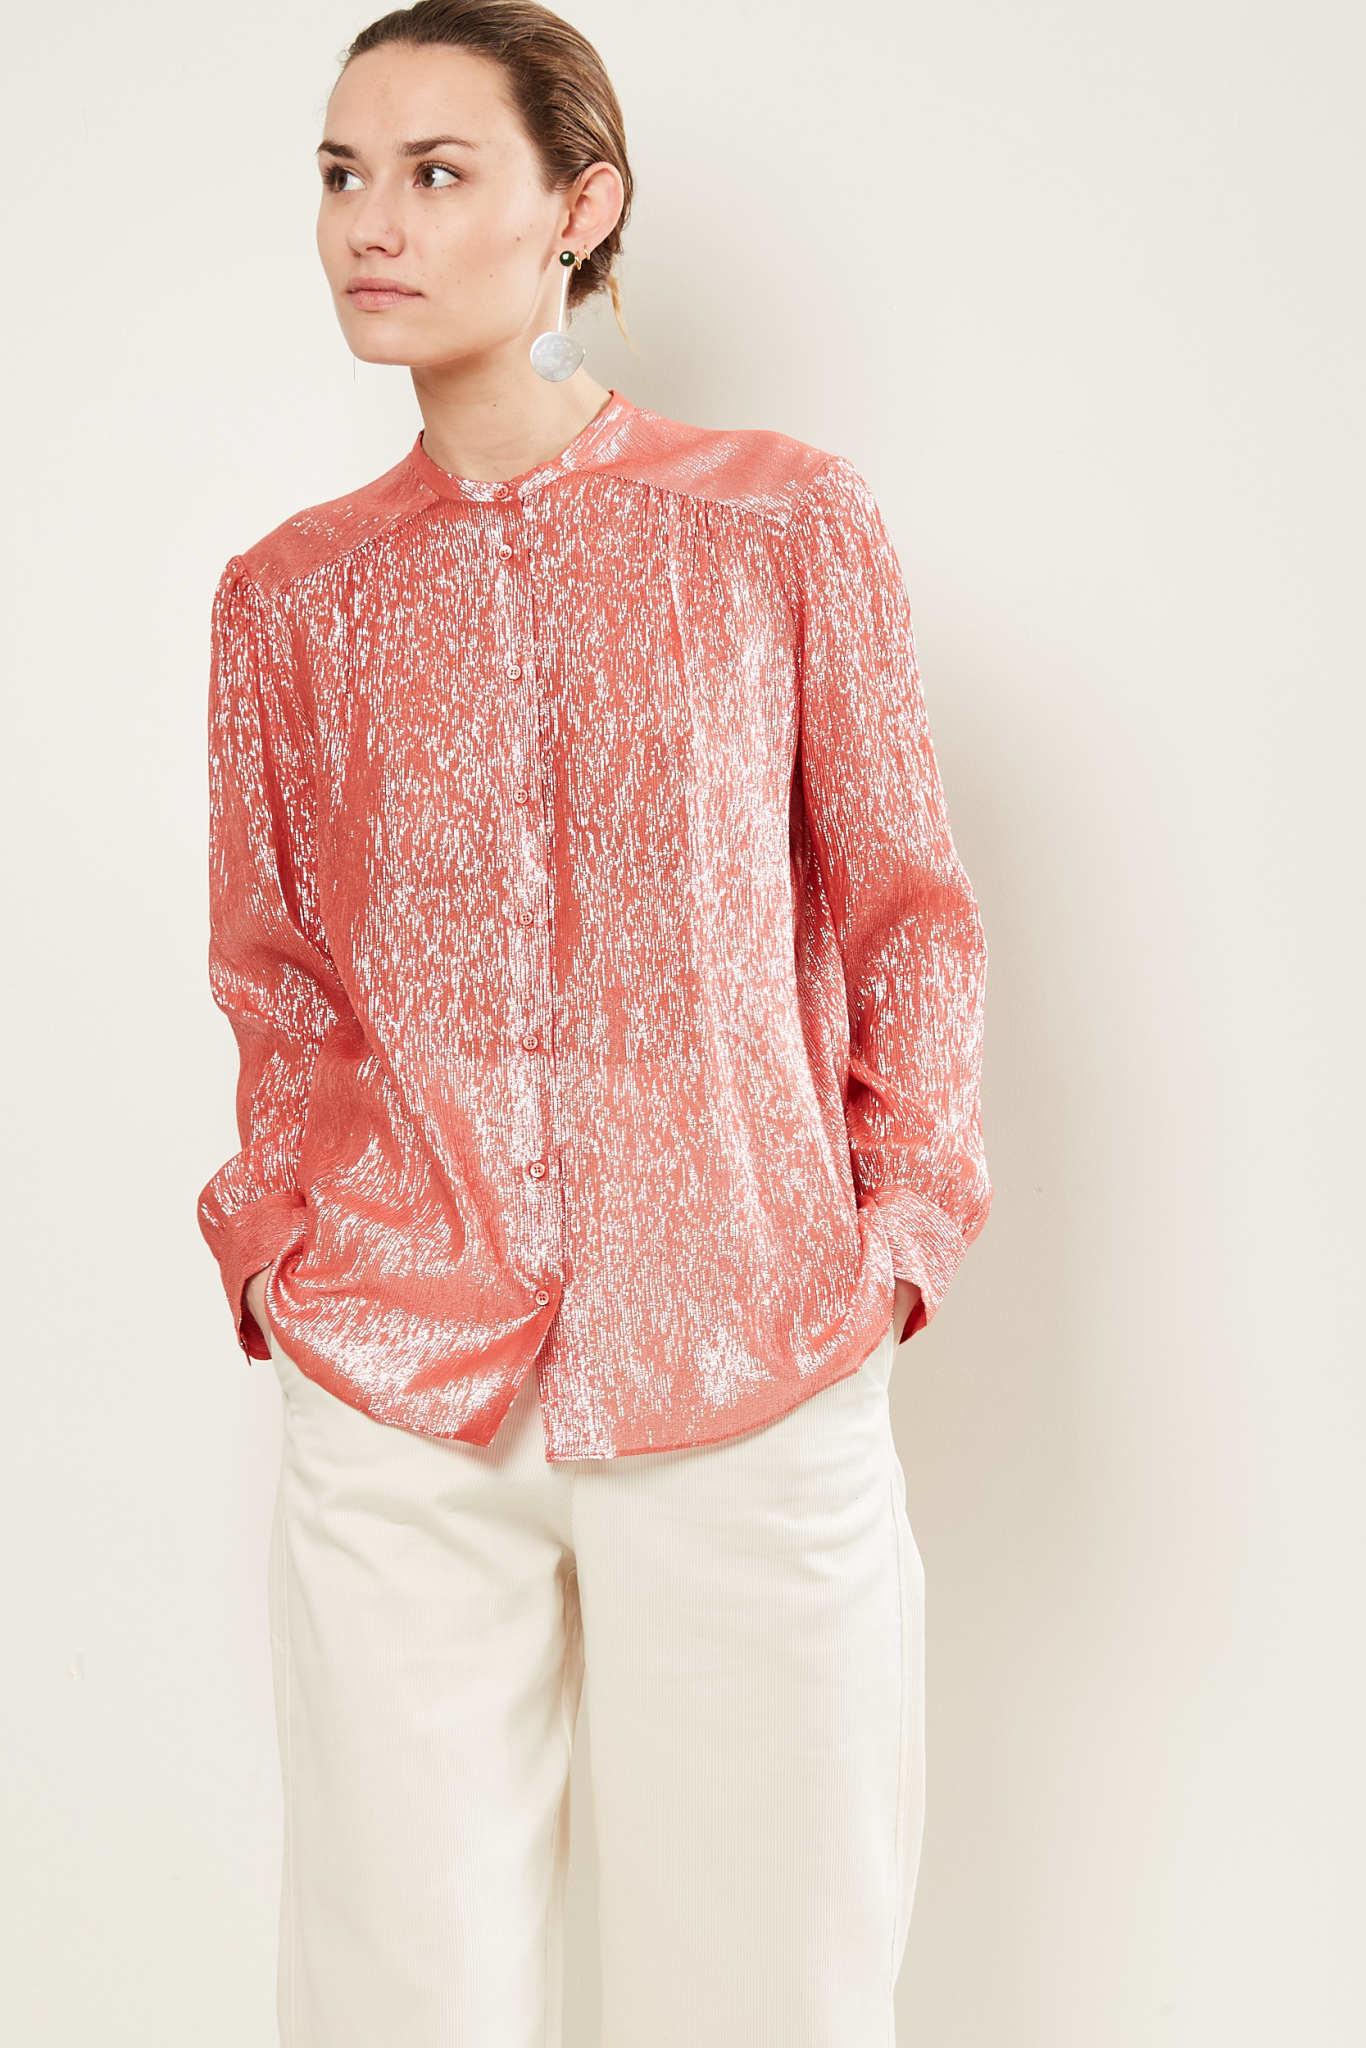 inDRESS Sparkling lurex blouse